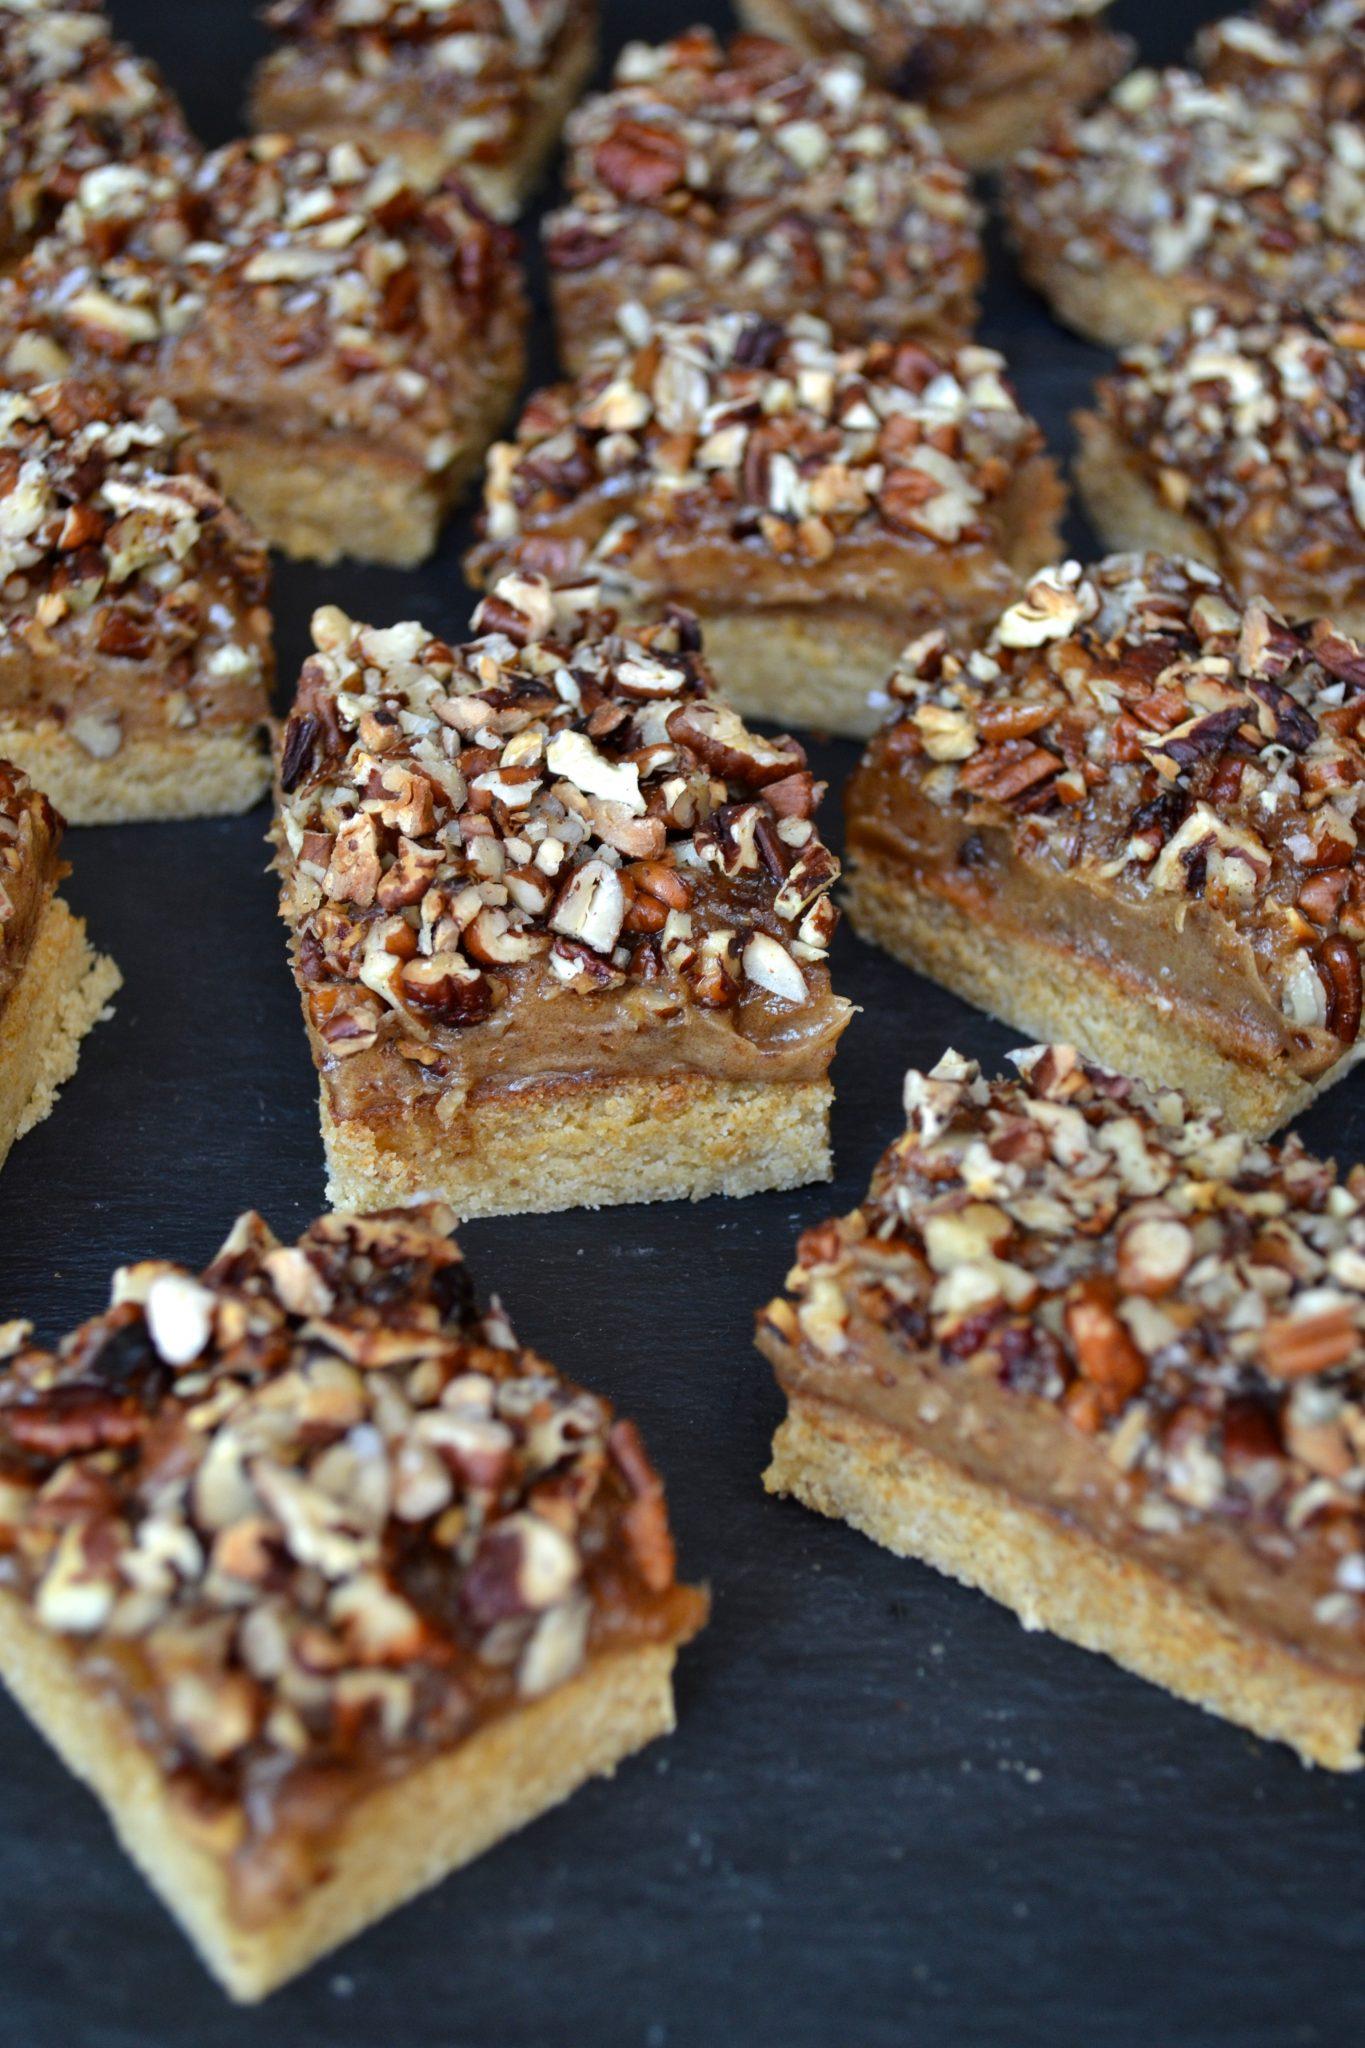 Pecan & Caramel Shortbread Bars | Every Last Bite